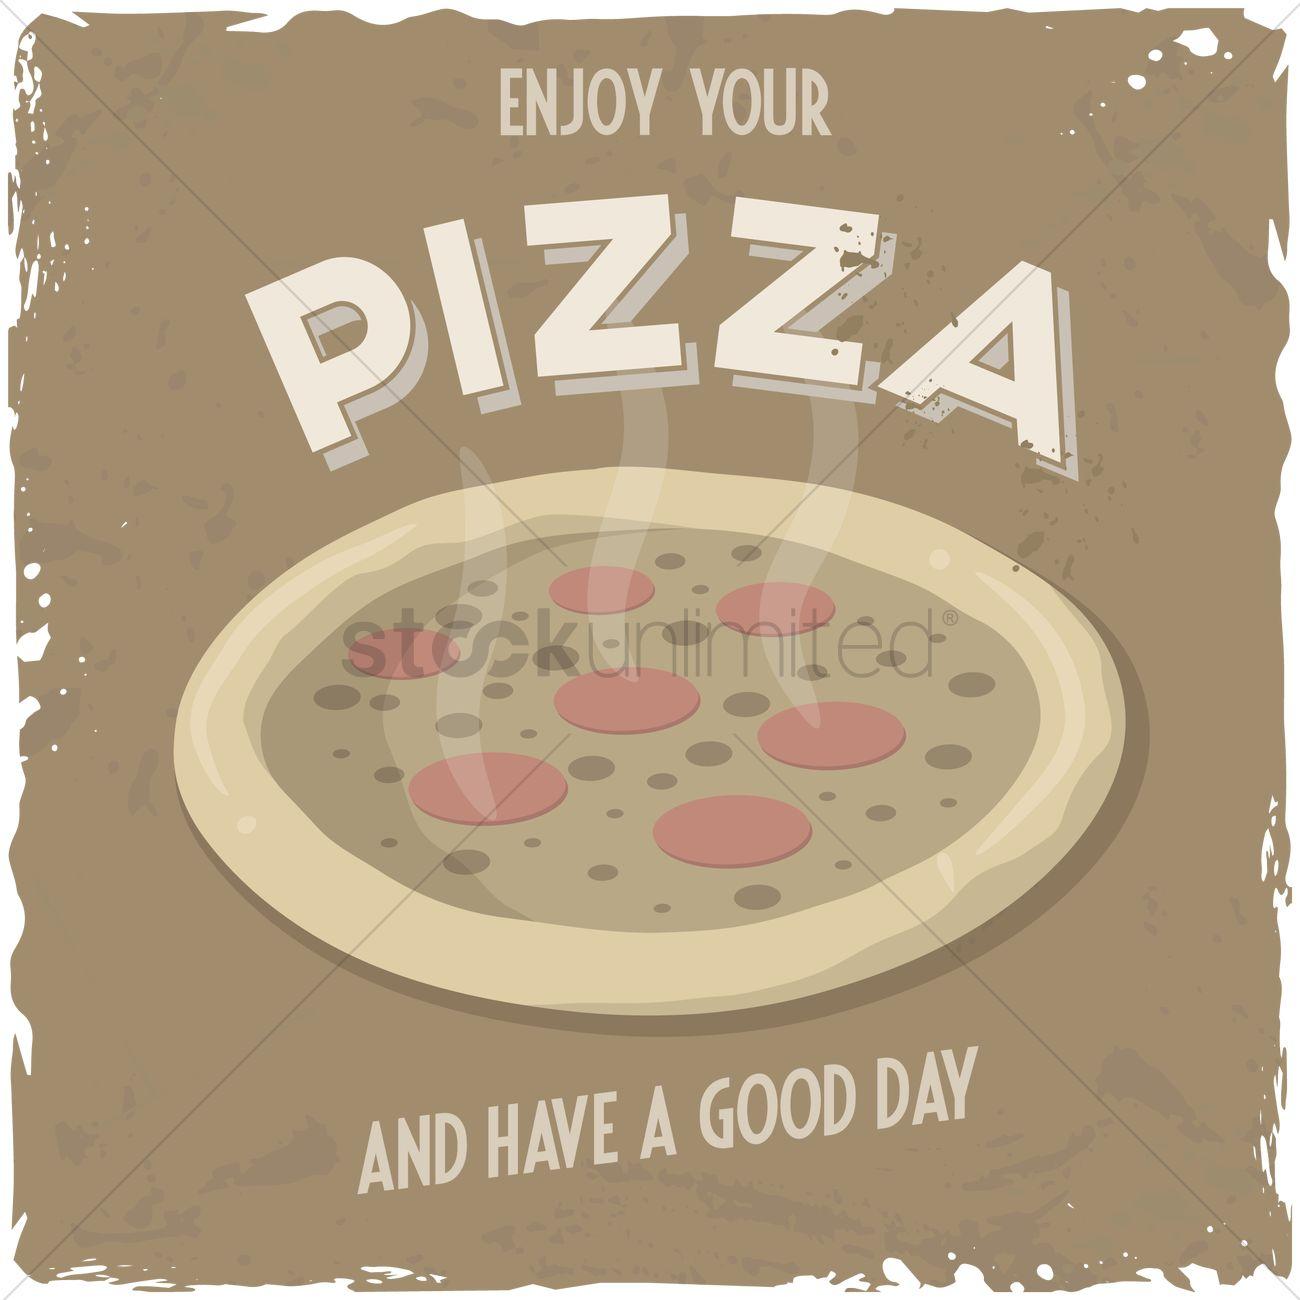 enjoy your pizza background vector image 1571652 stockunlimited. Black Bedroom Furniture Sets. Home Design Ideas